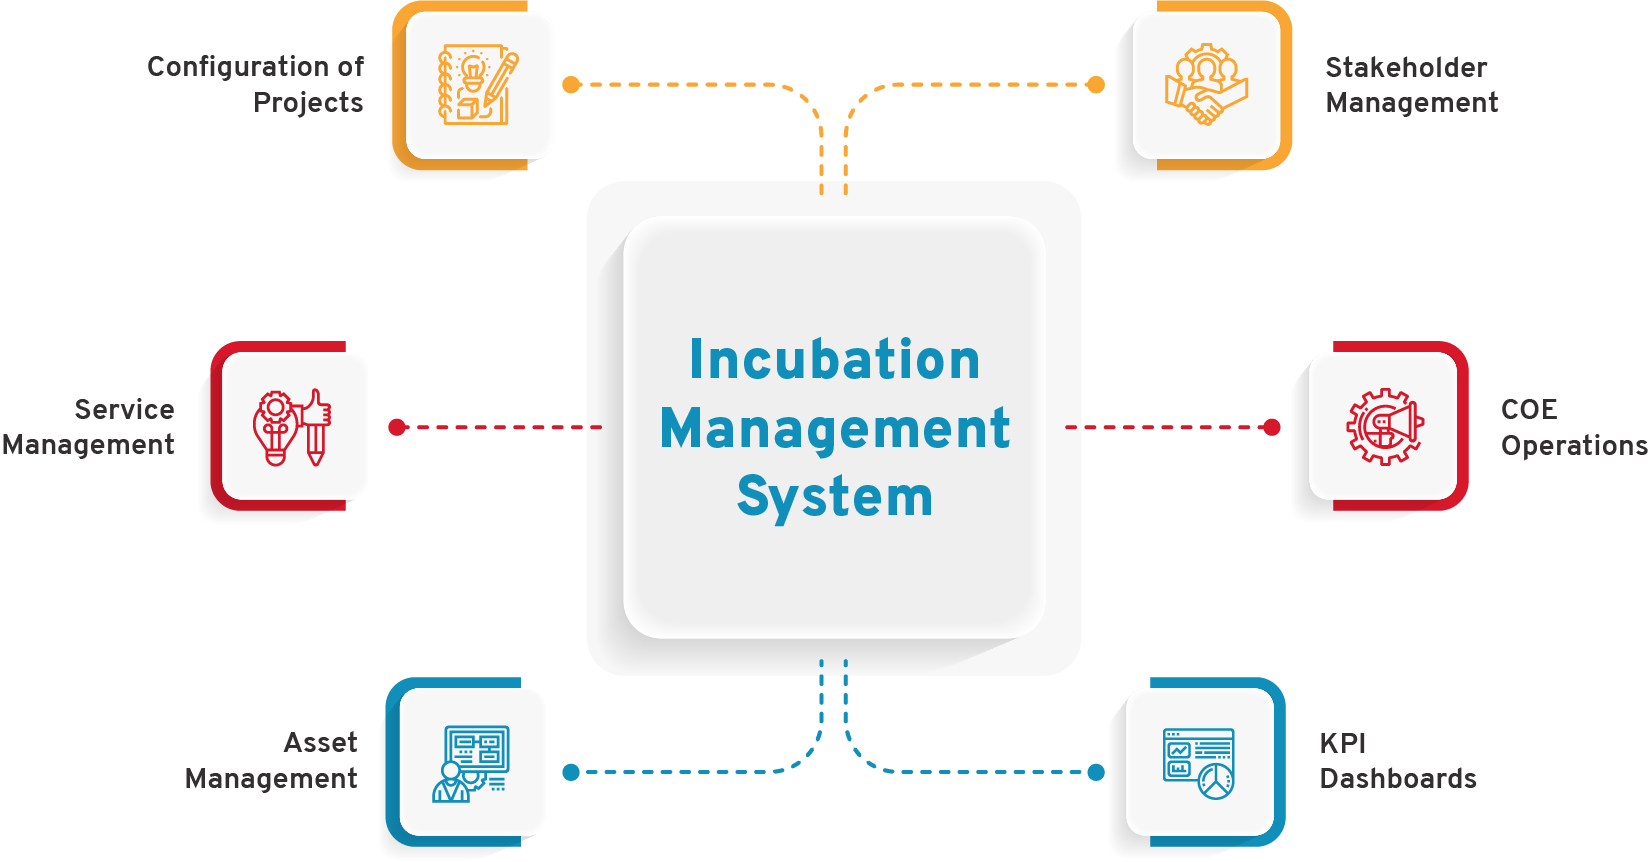 Incubation Management System